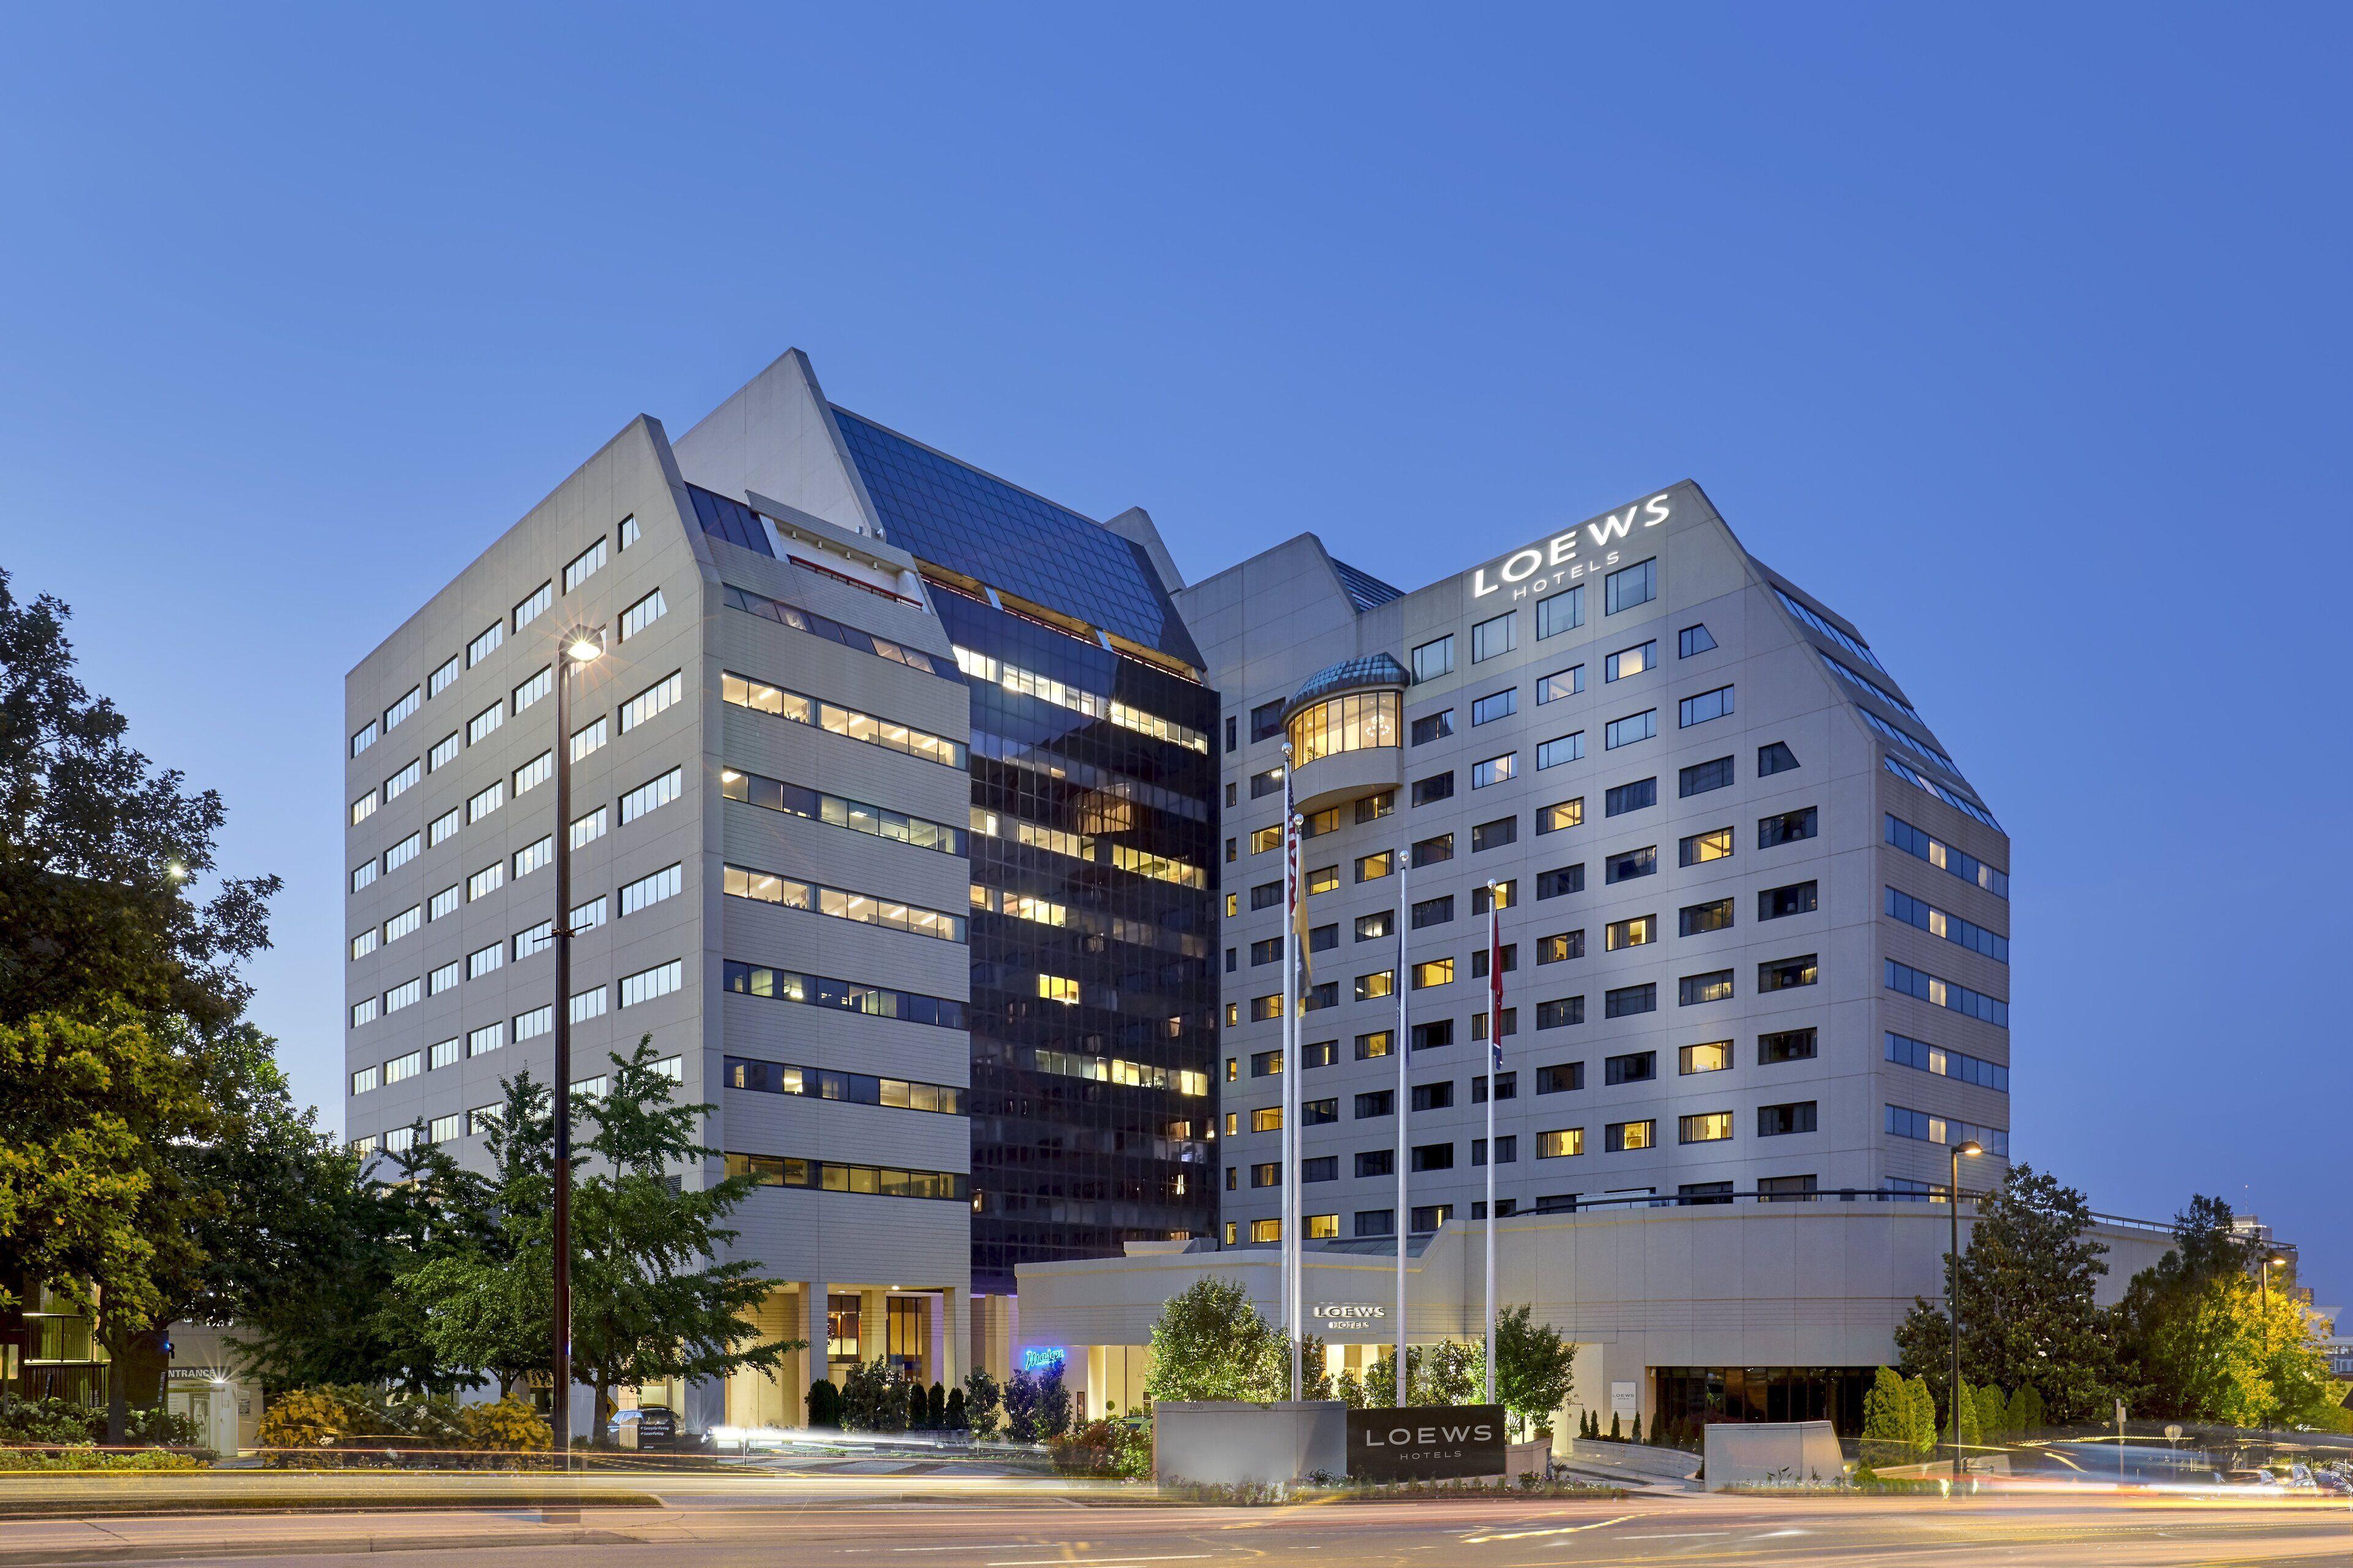 Courtesy of Loews Vanderbilt Hotel / Expedia.com